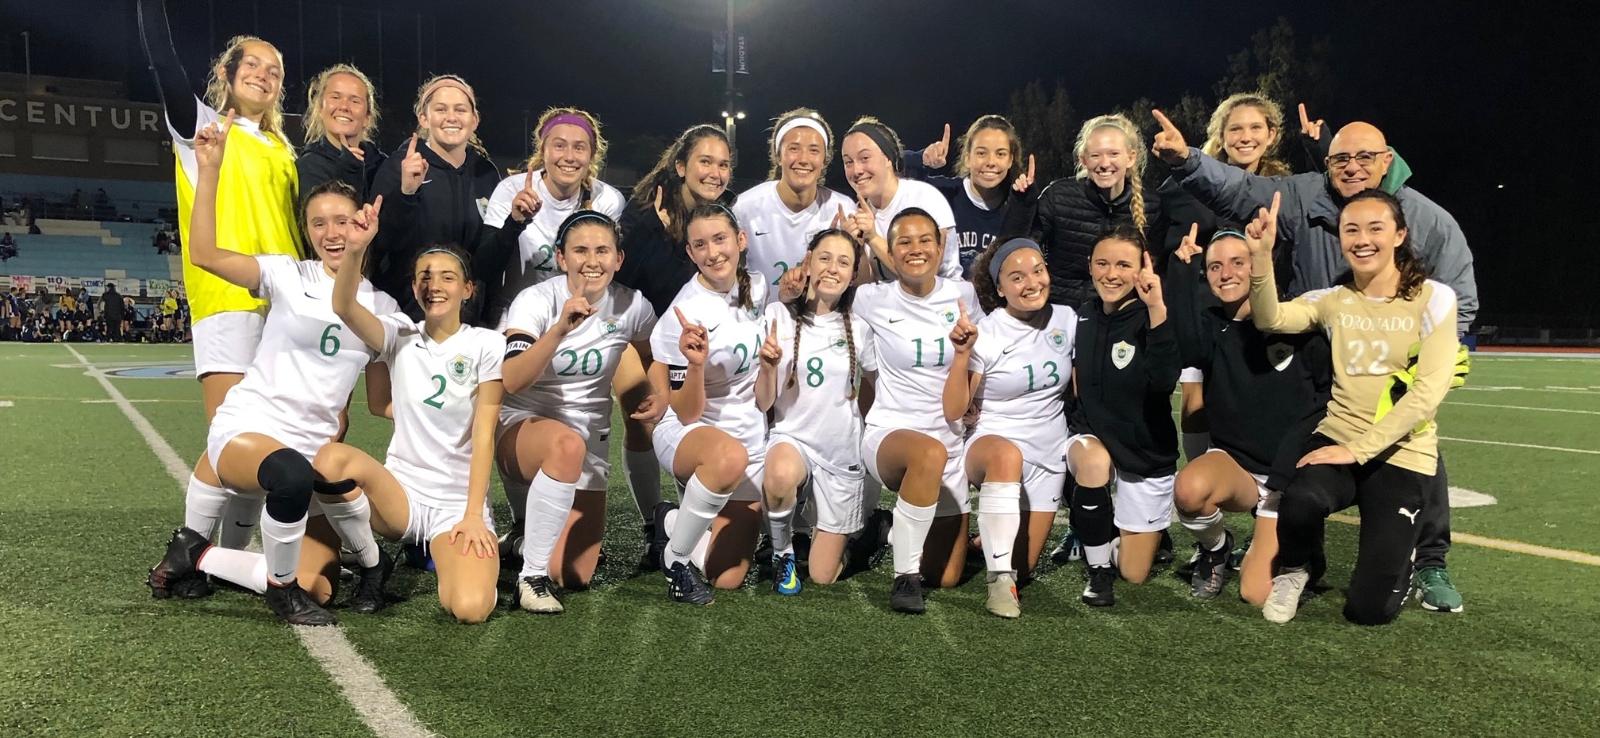 Girls Soccer Headed to Semi-Finals